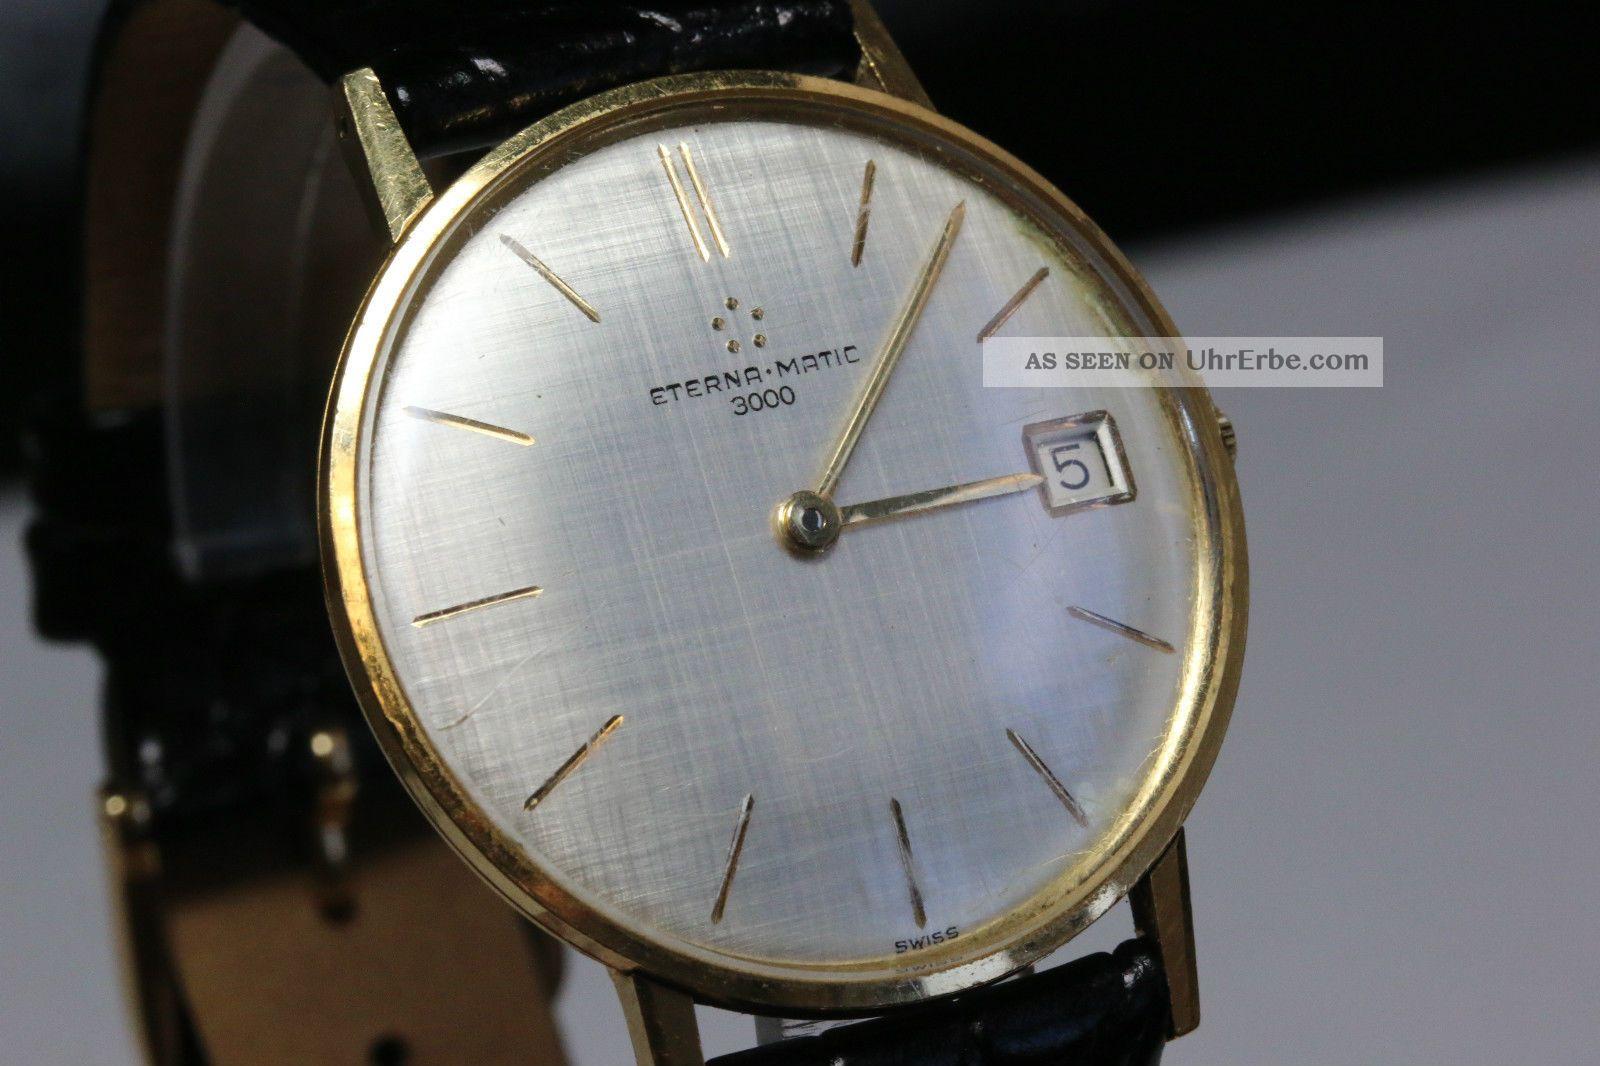 Eterna - Matic 3000 Gold,  Automatikwerk,  Inkl.  Box Und Papiere Avs2722 Dif Rwt1 Armbanduhren Bild